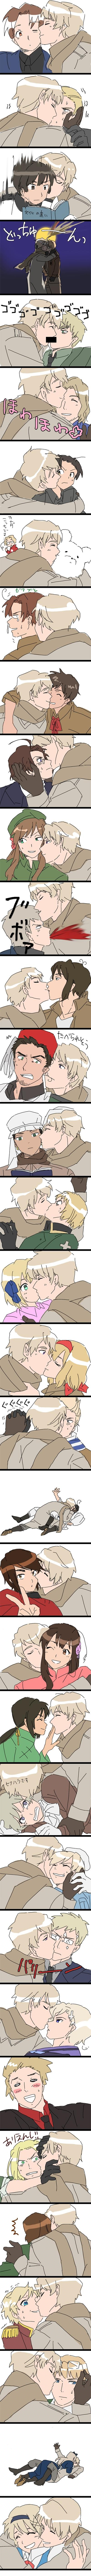 Tags: Anime, Pixiv Id 1342329, Axis Powers: Hetalia, China, United States, Poland, Switzerland, Ukraine, Canada, Belgium, Hungary, Germany, Vietnam